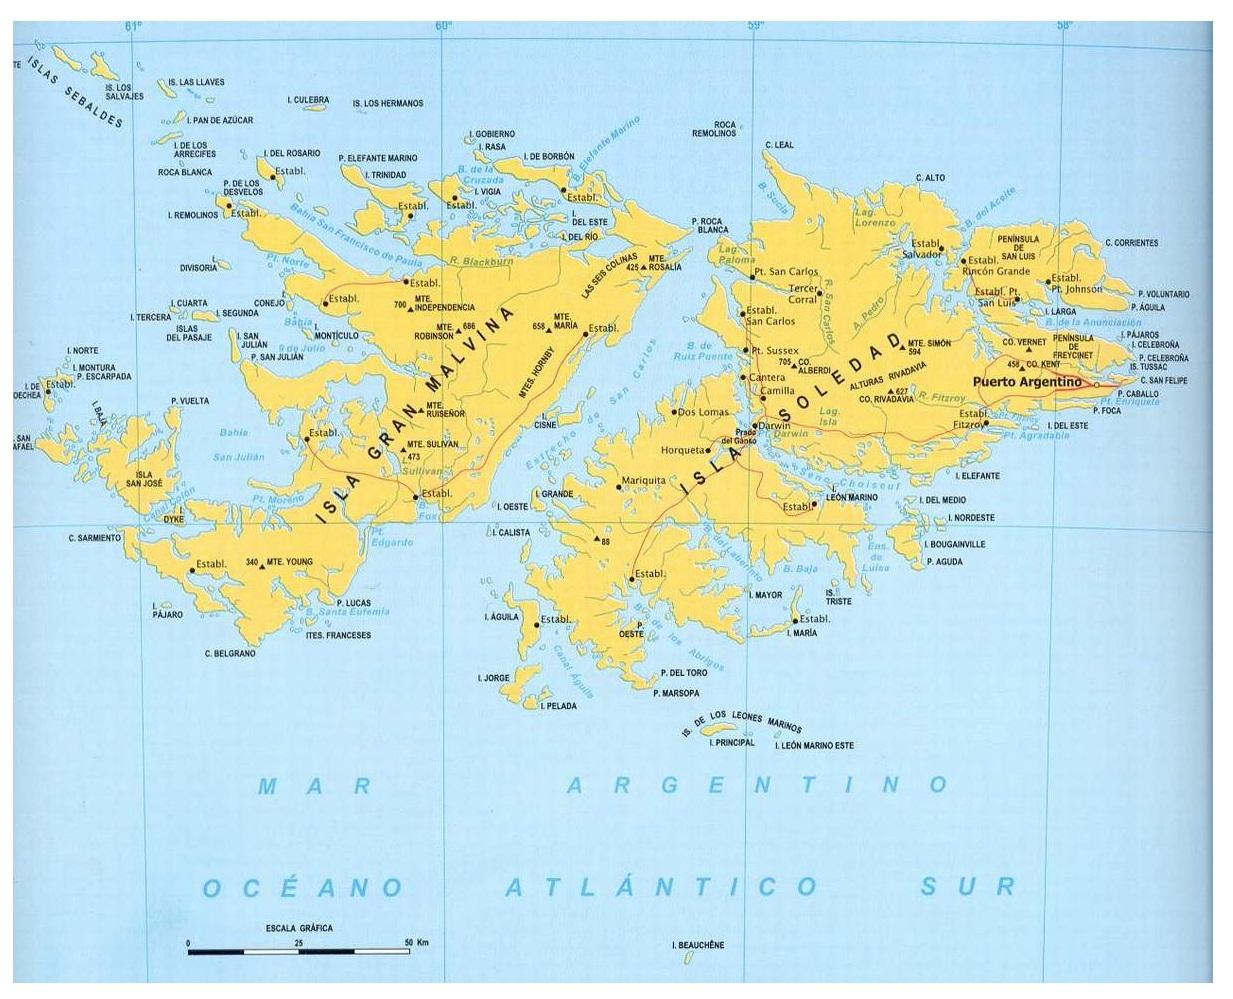 Islas-Malvinas-12